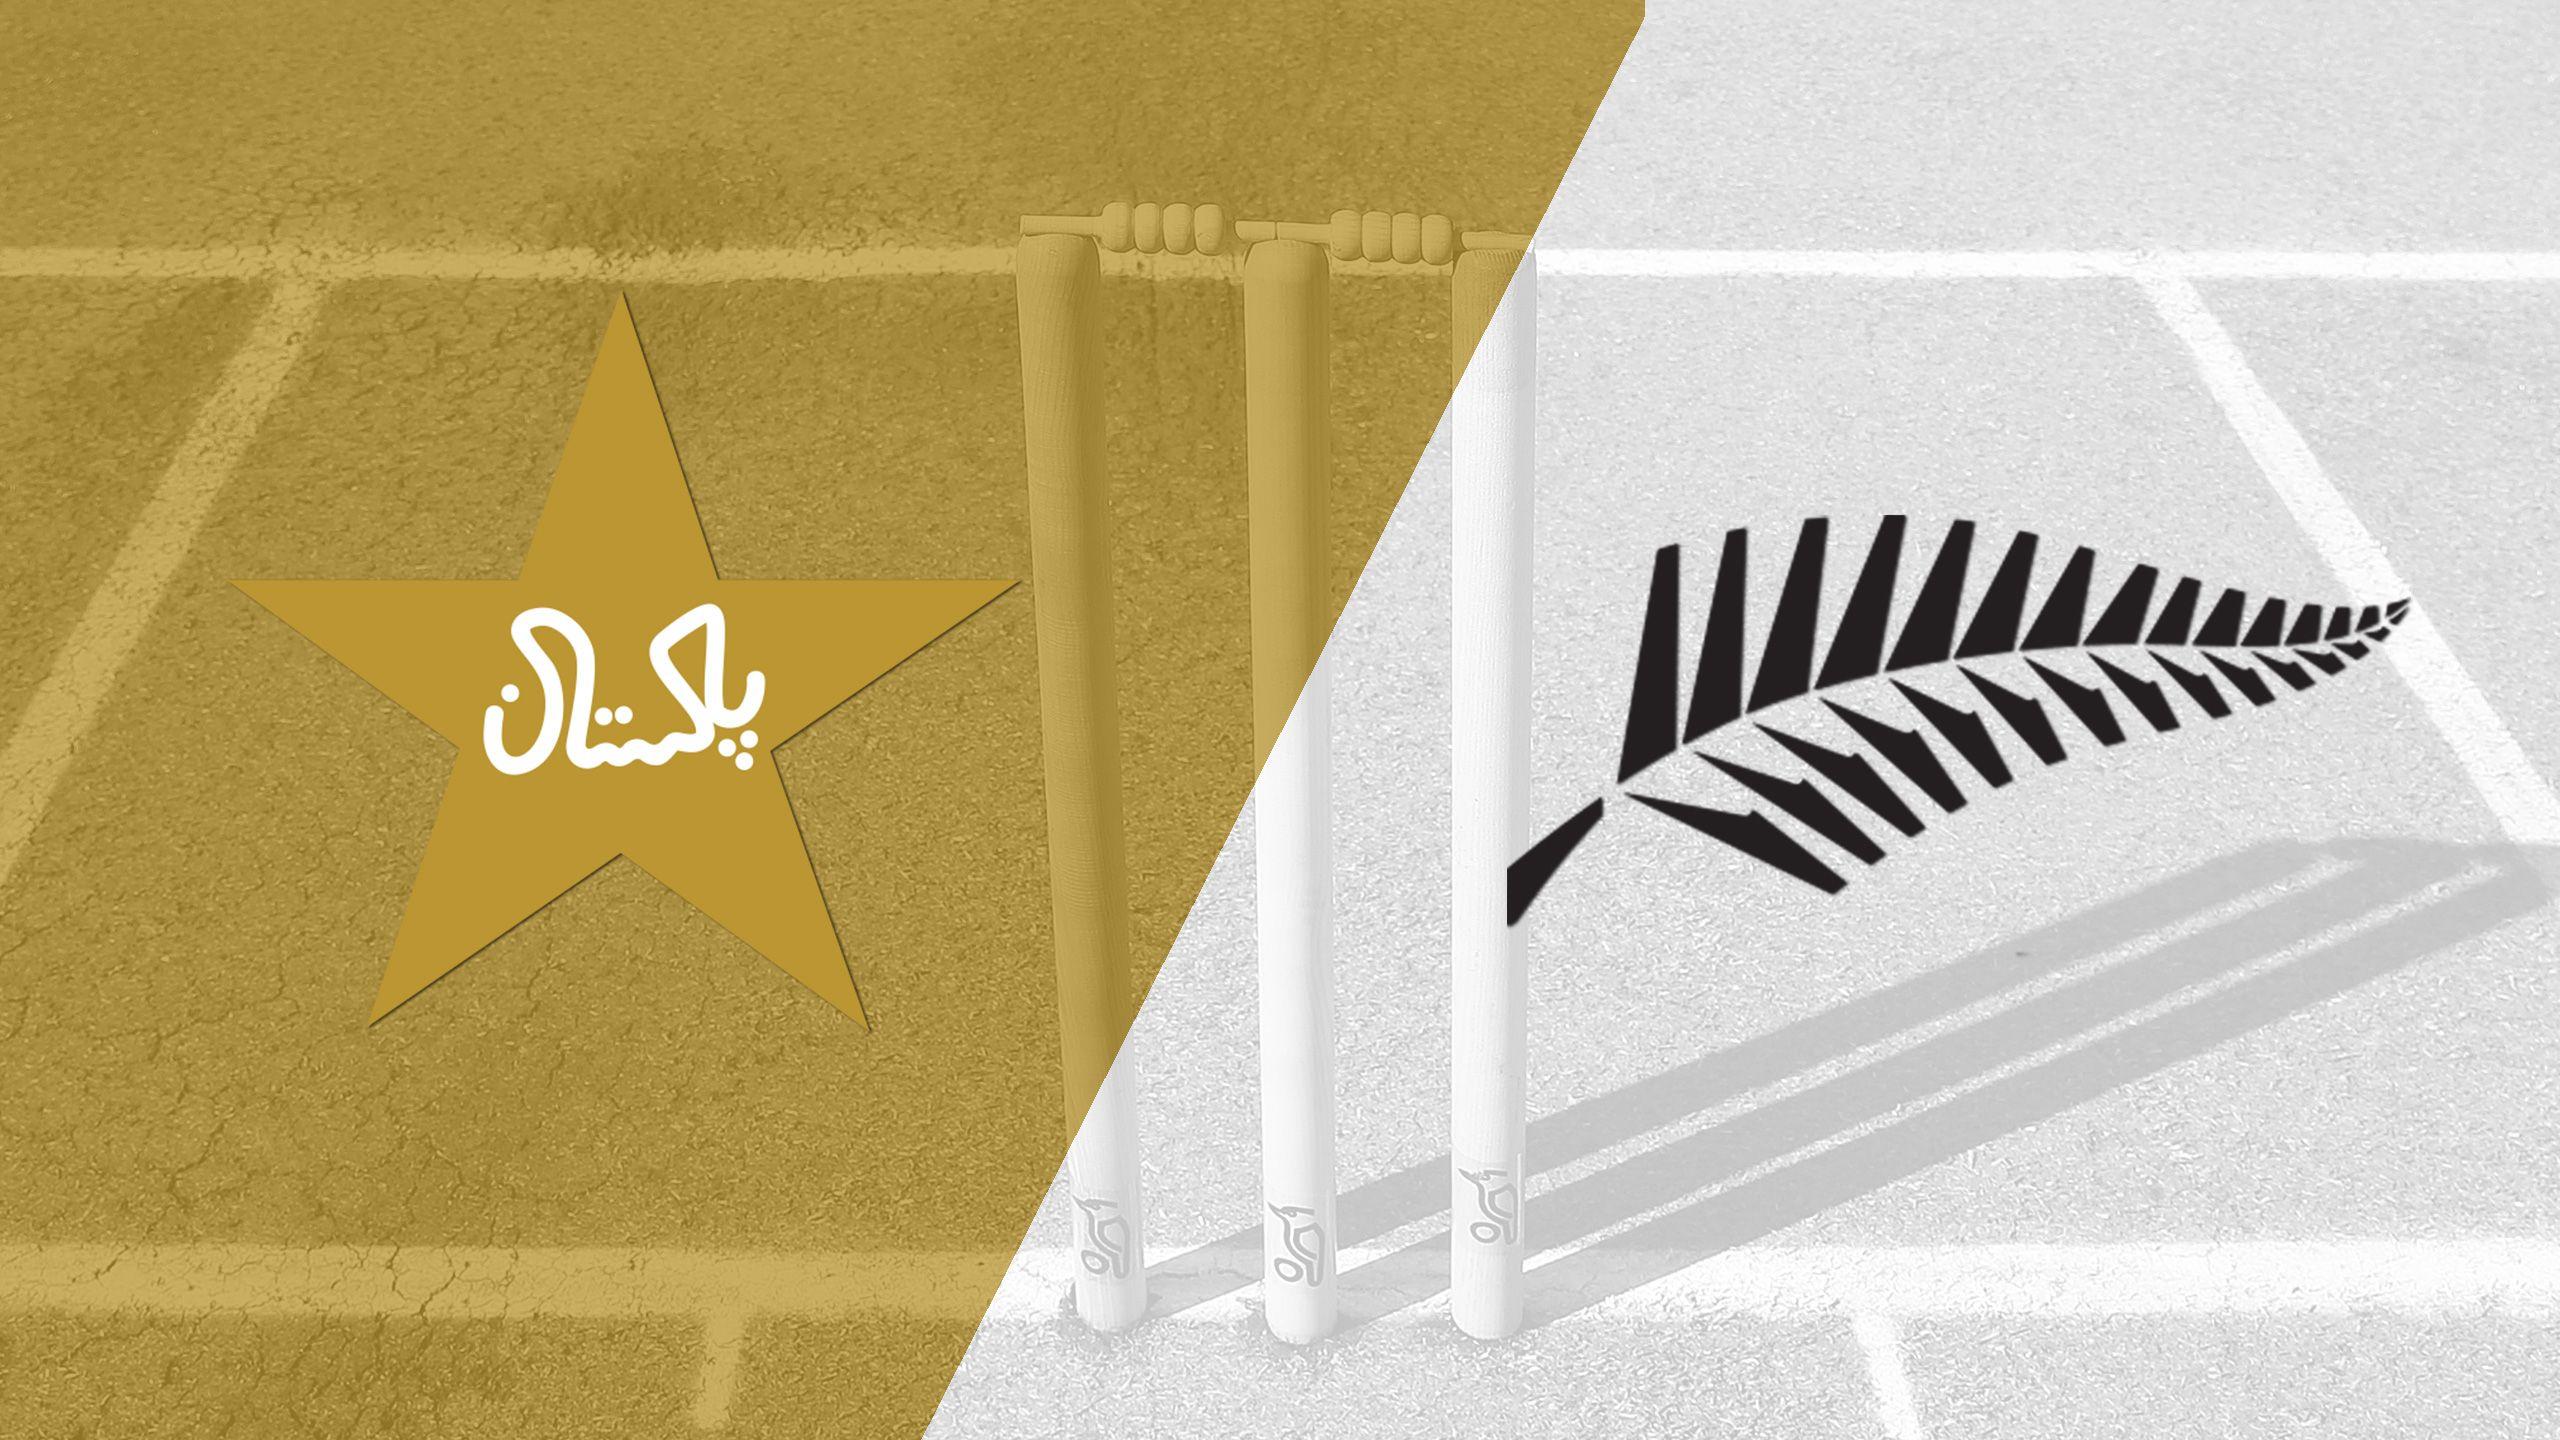 Pakistan vs. New Zealand (5th ODI) (International Cricket)